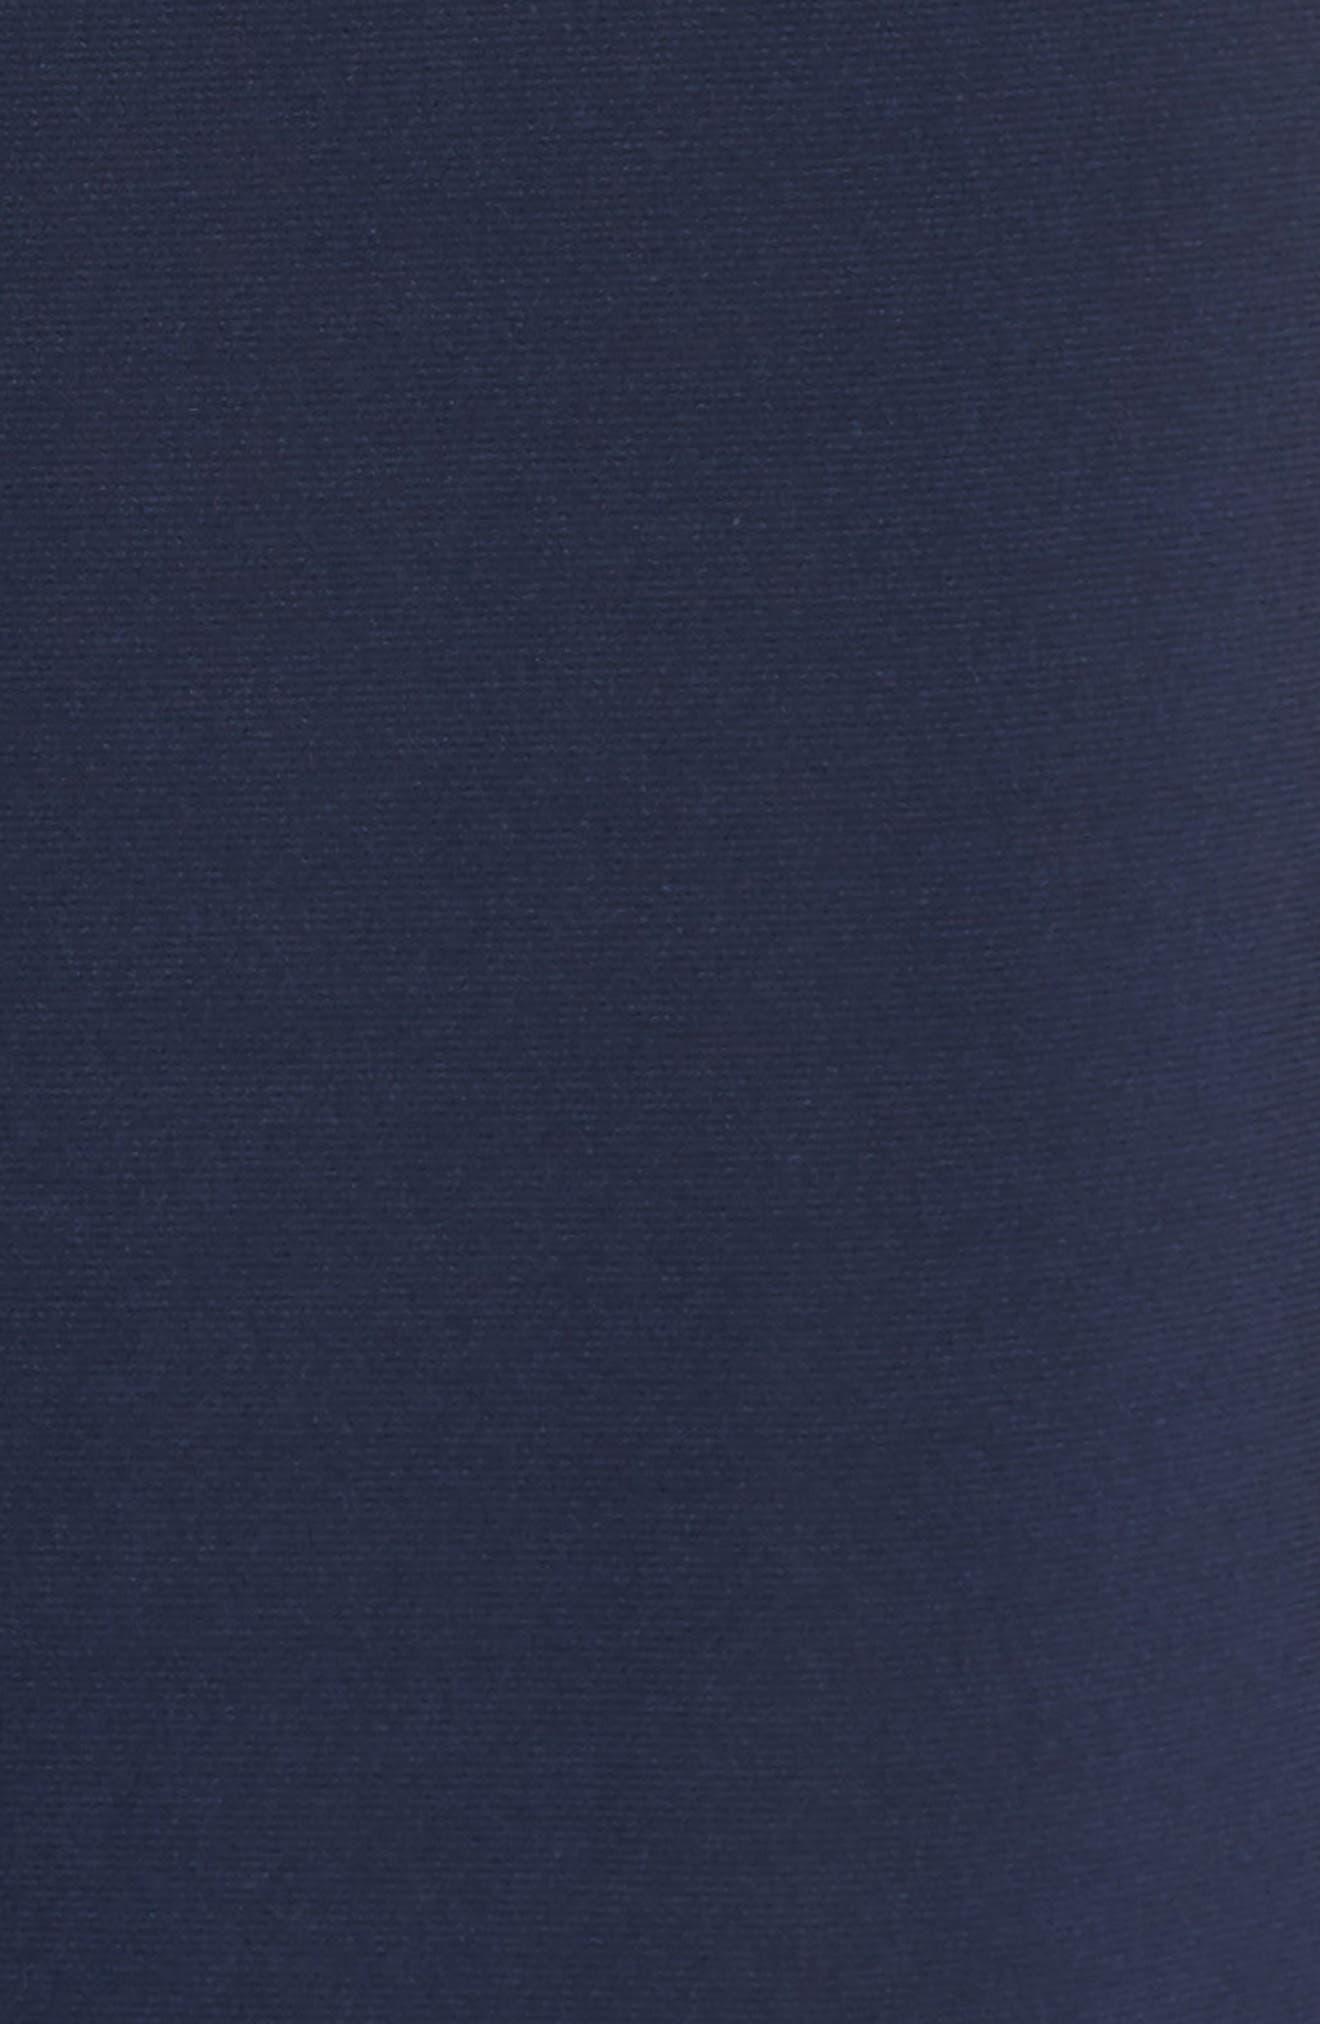 Jersey Column Gown,                             Alternate thumbnail 5, color,                             410